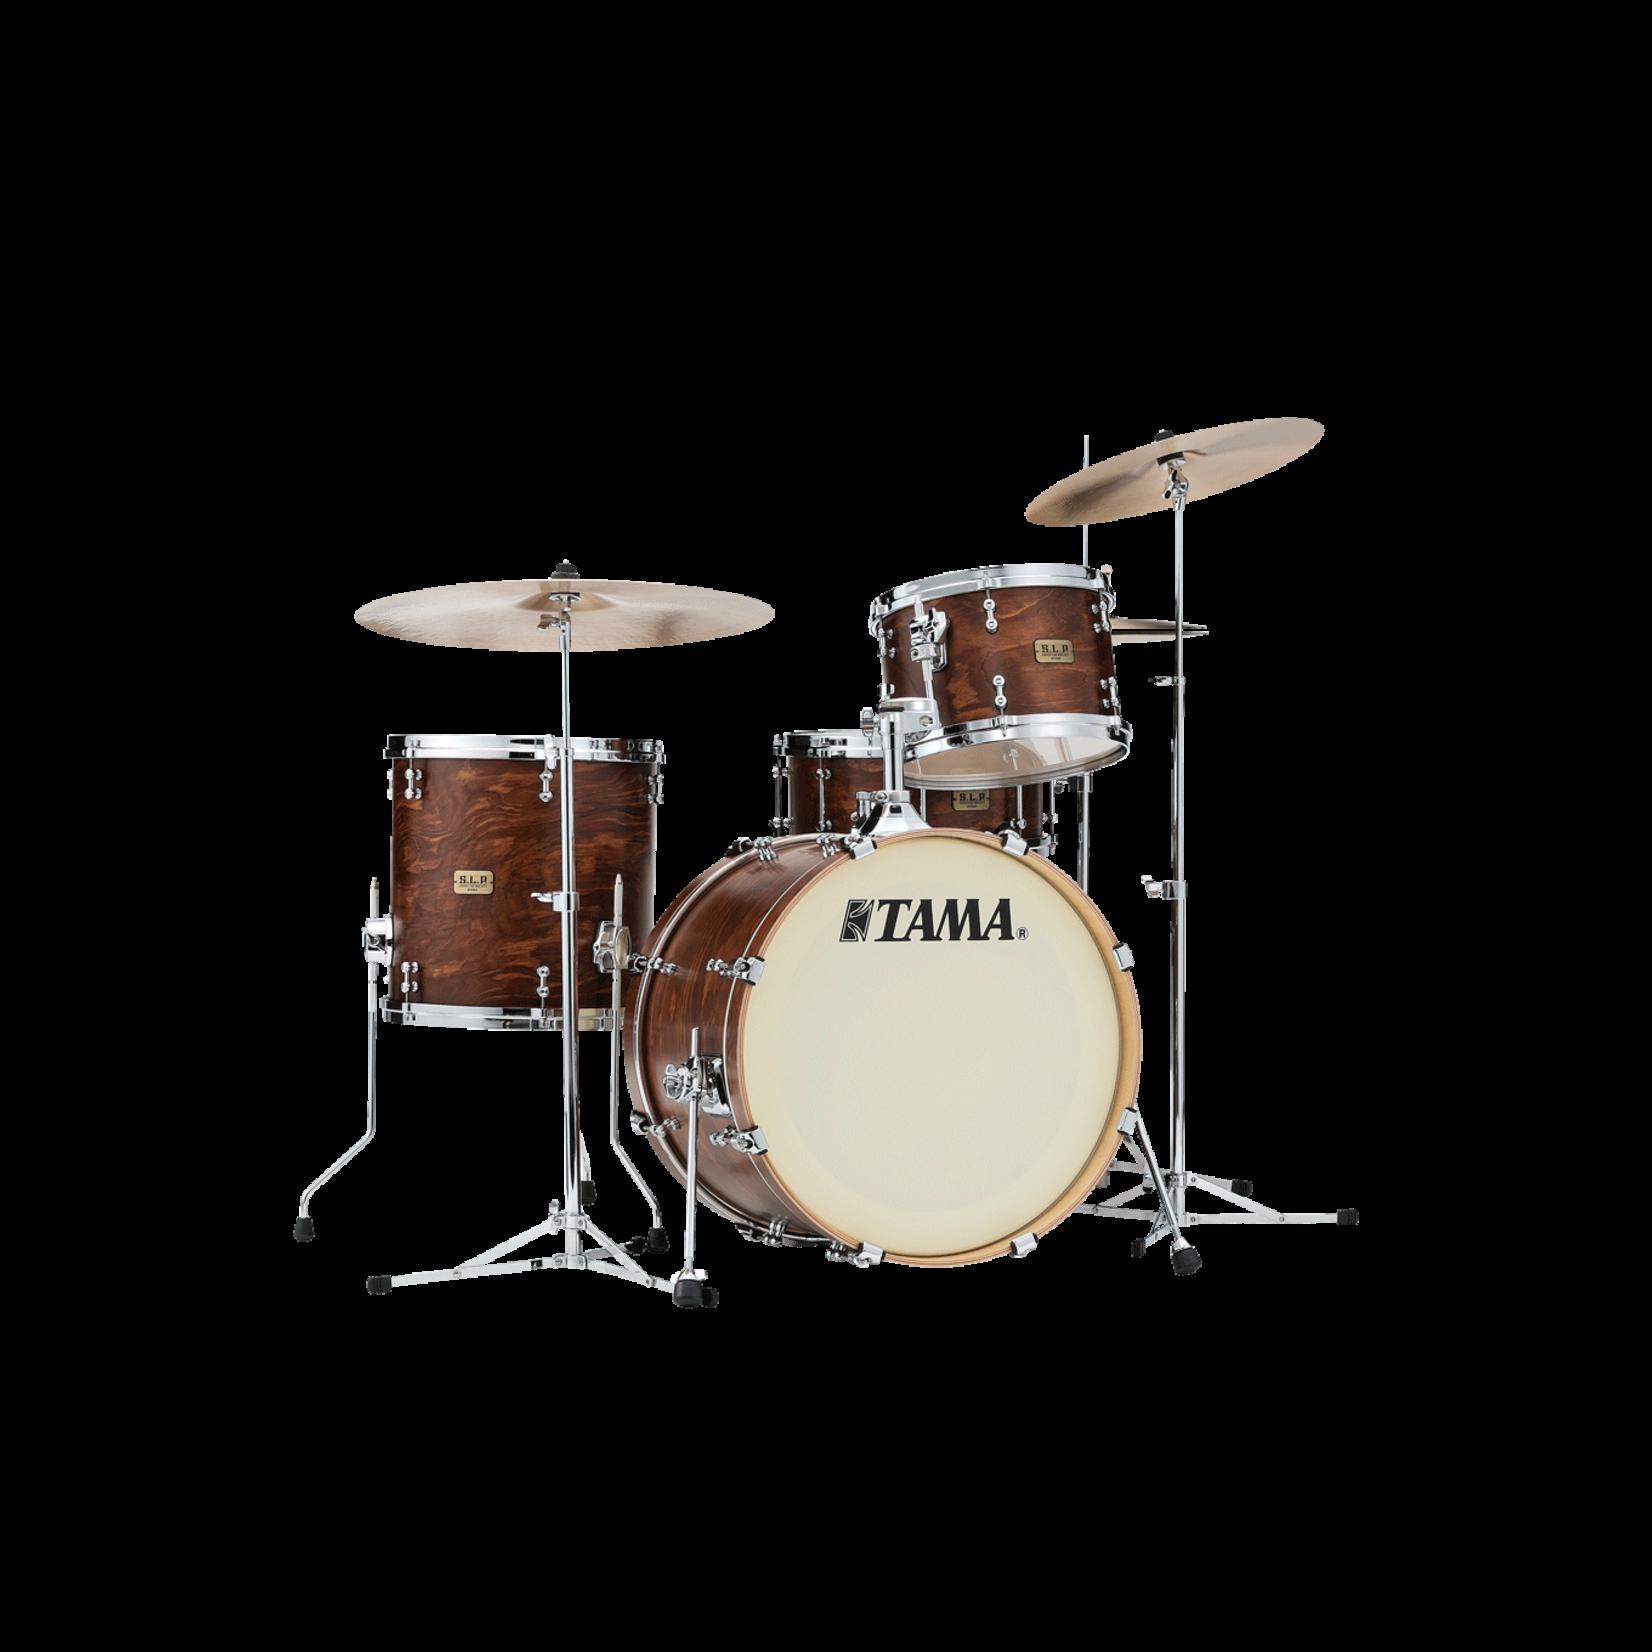 "Tama SLP Spruce 3pc Drum Kit ""Wild Satin Spruce"""